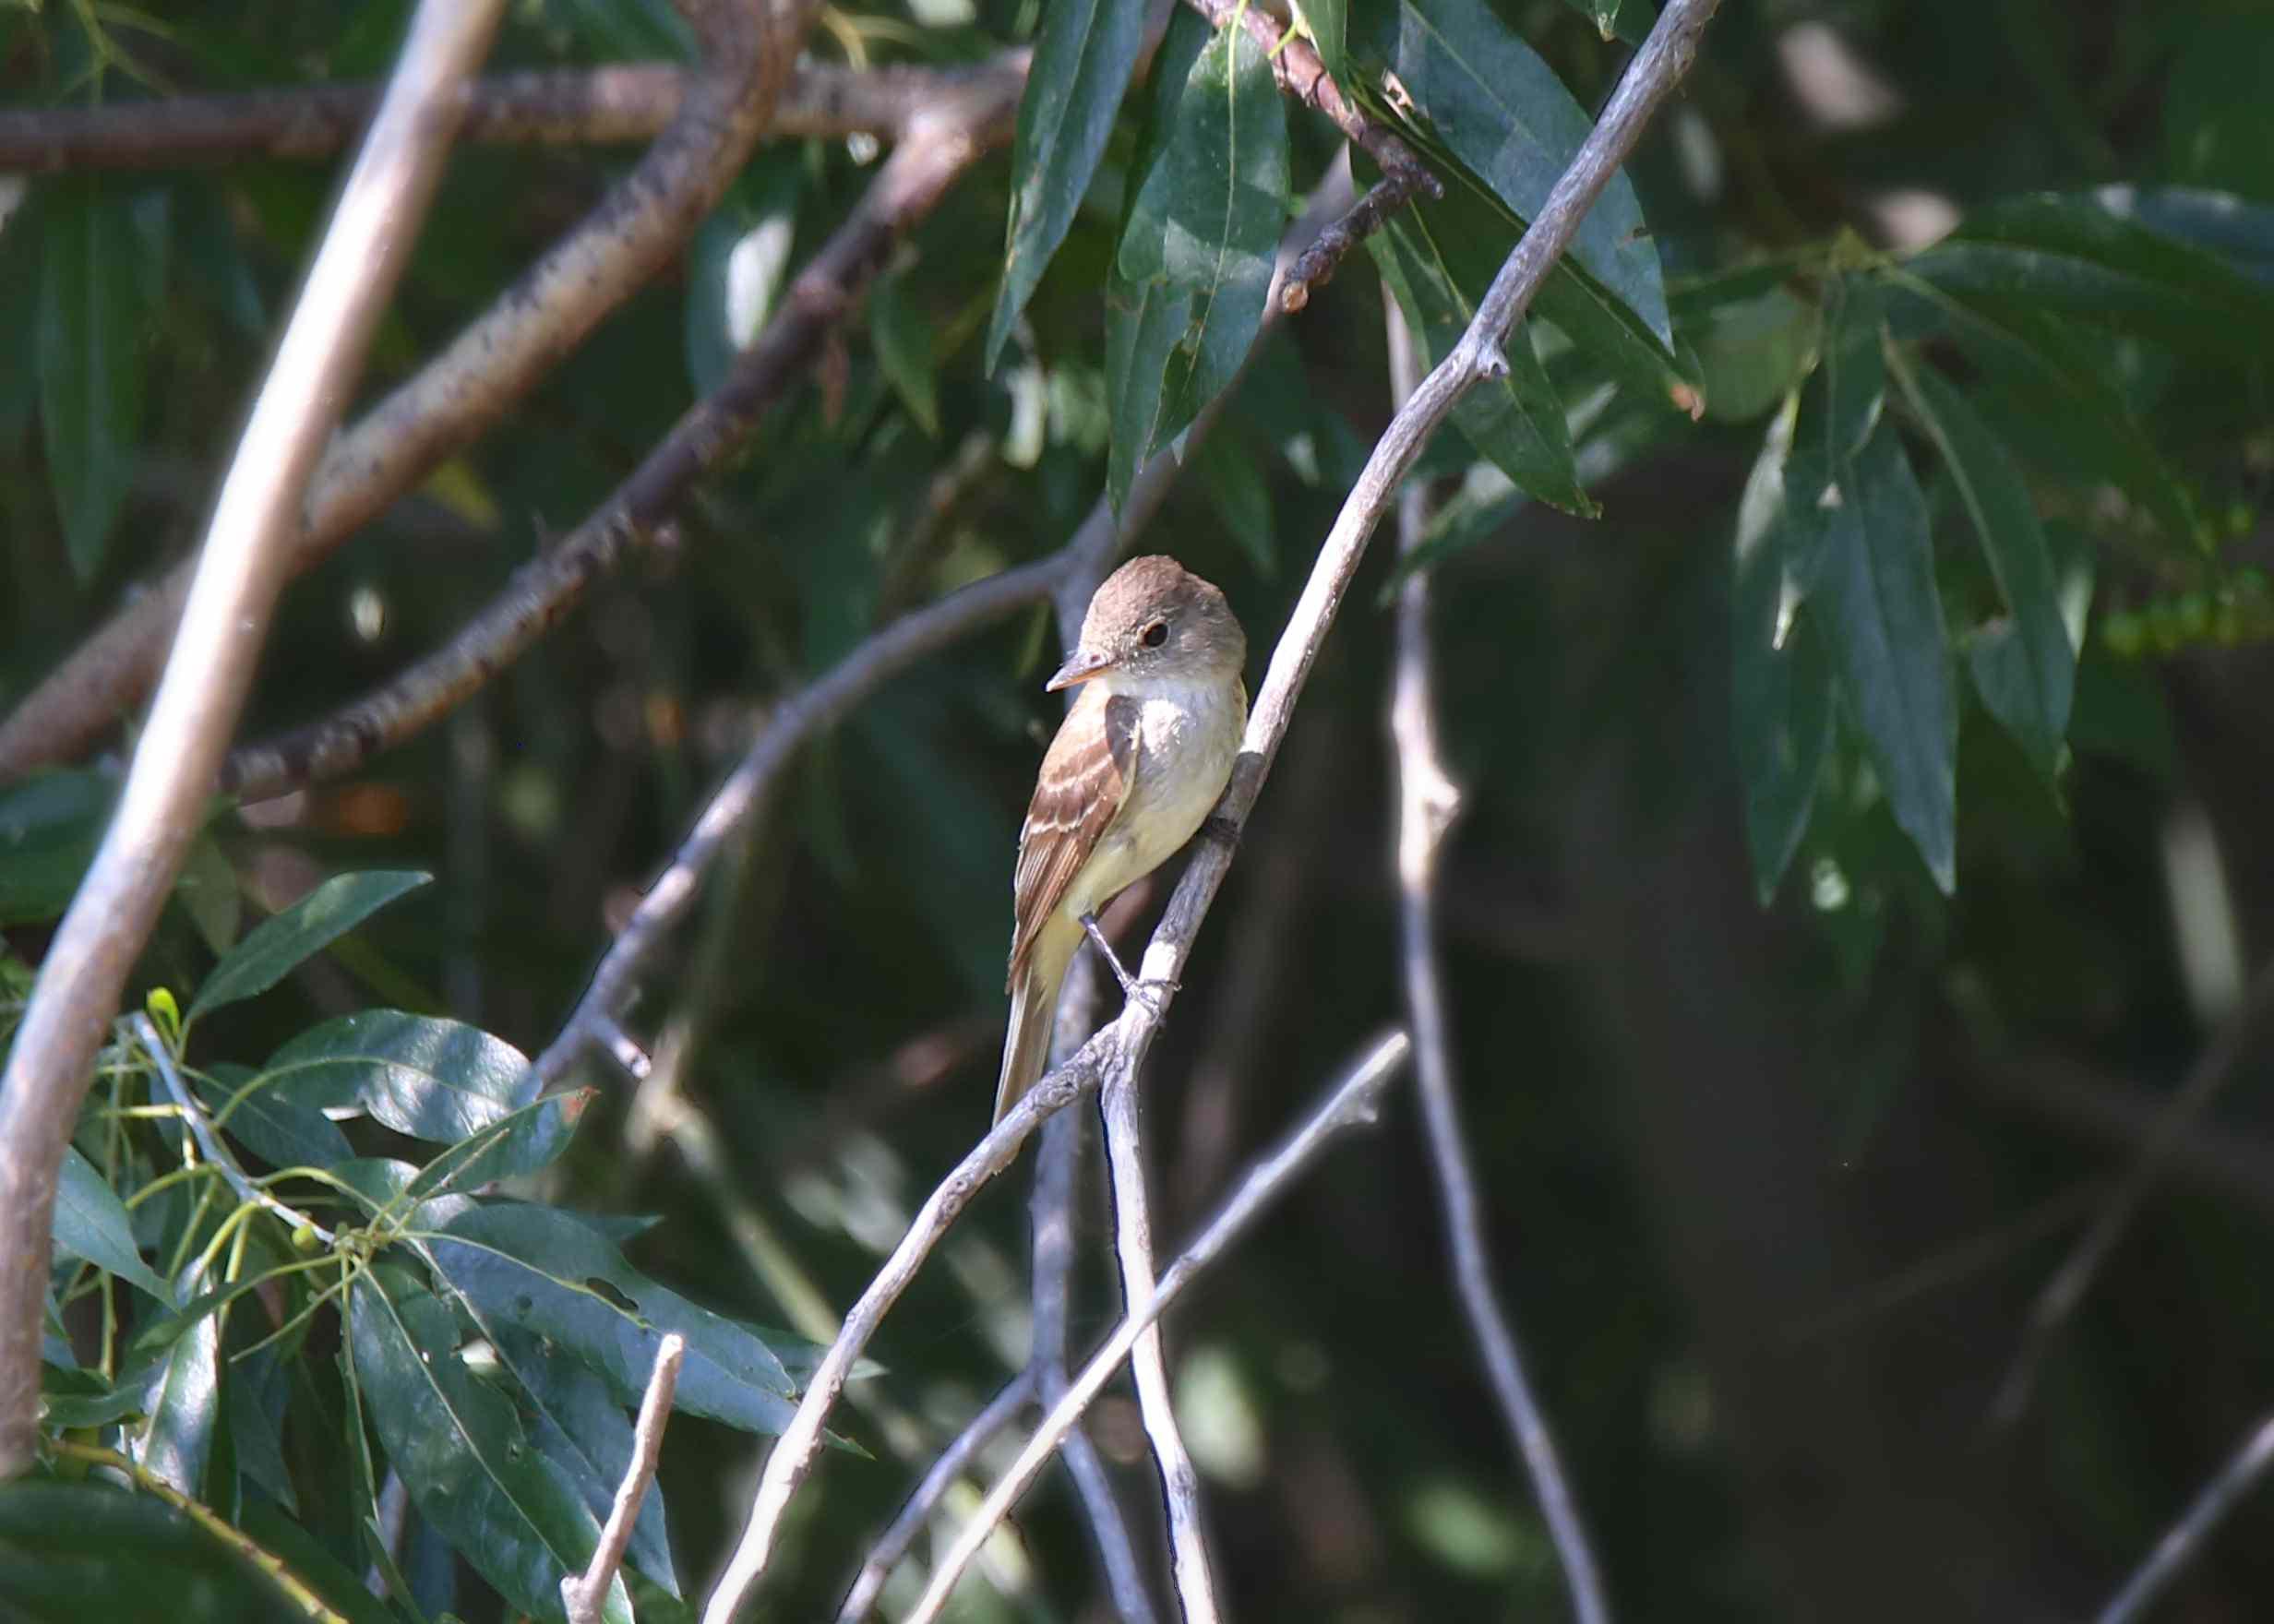 ash-throated flycatcher bird